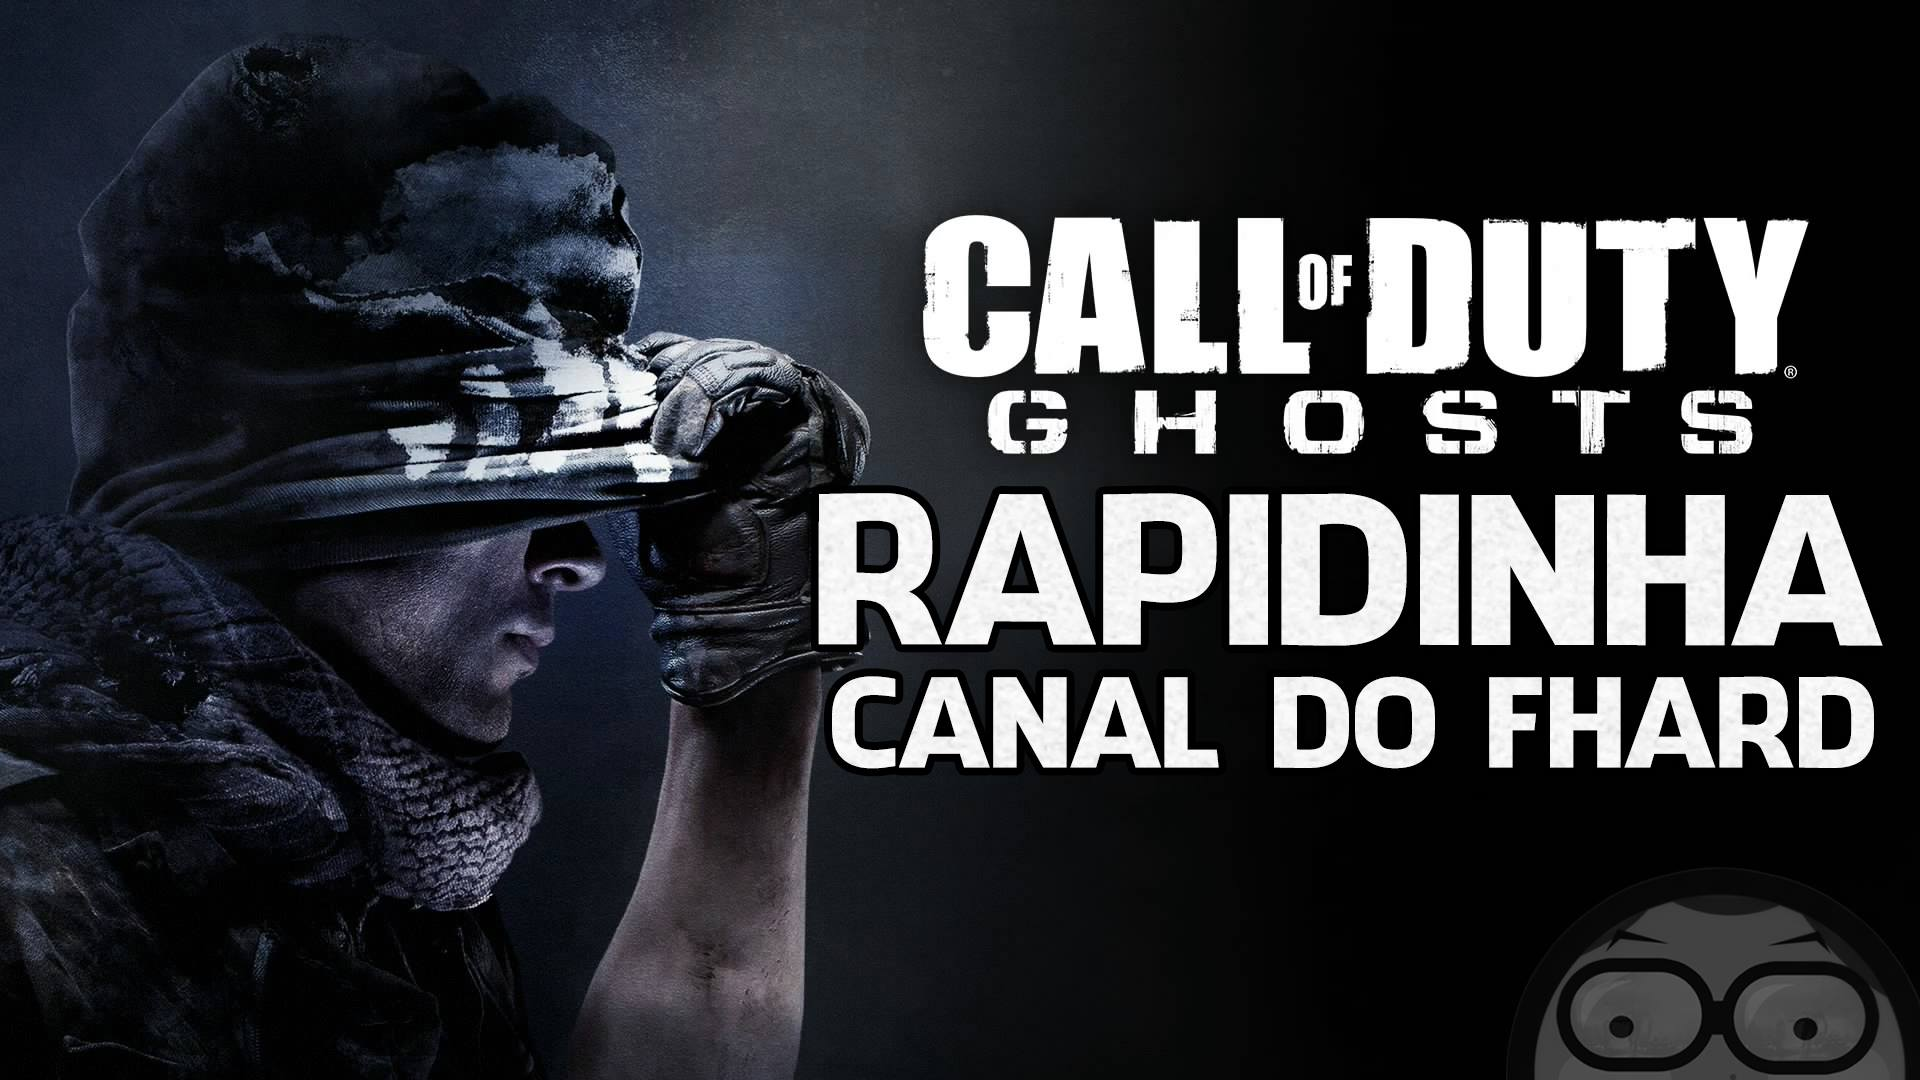 Call of Duty Ghosts - Rapidinha - FHard